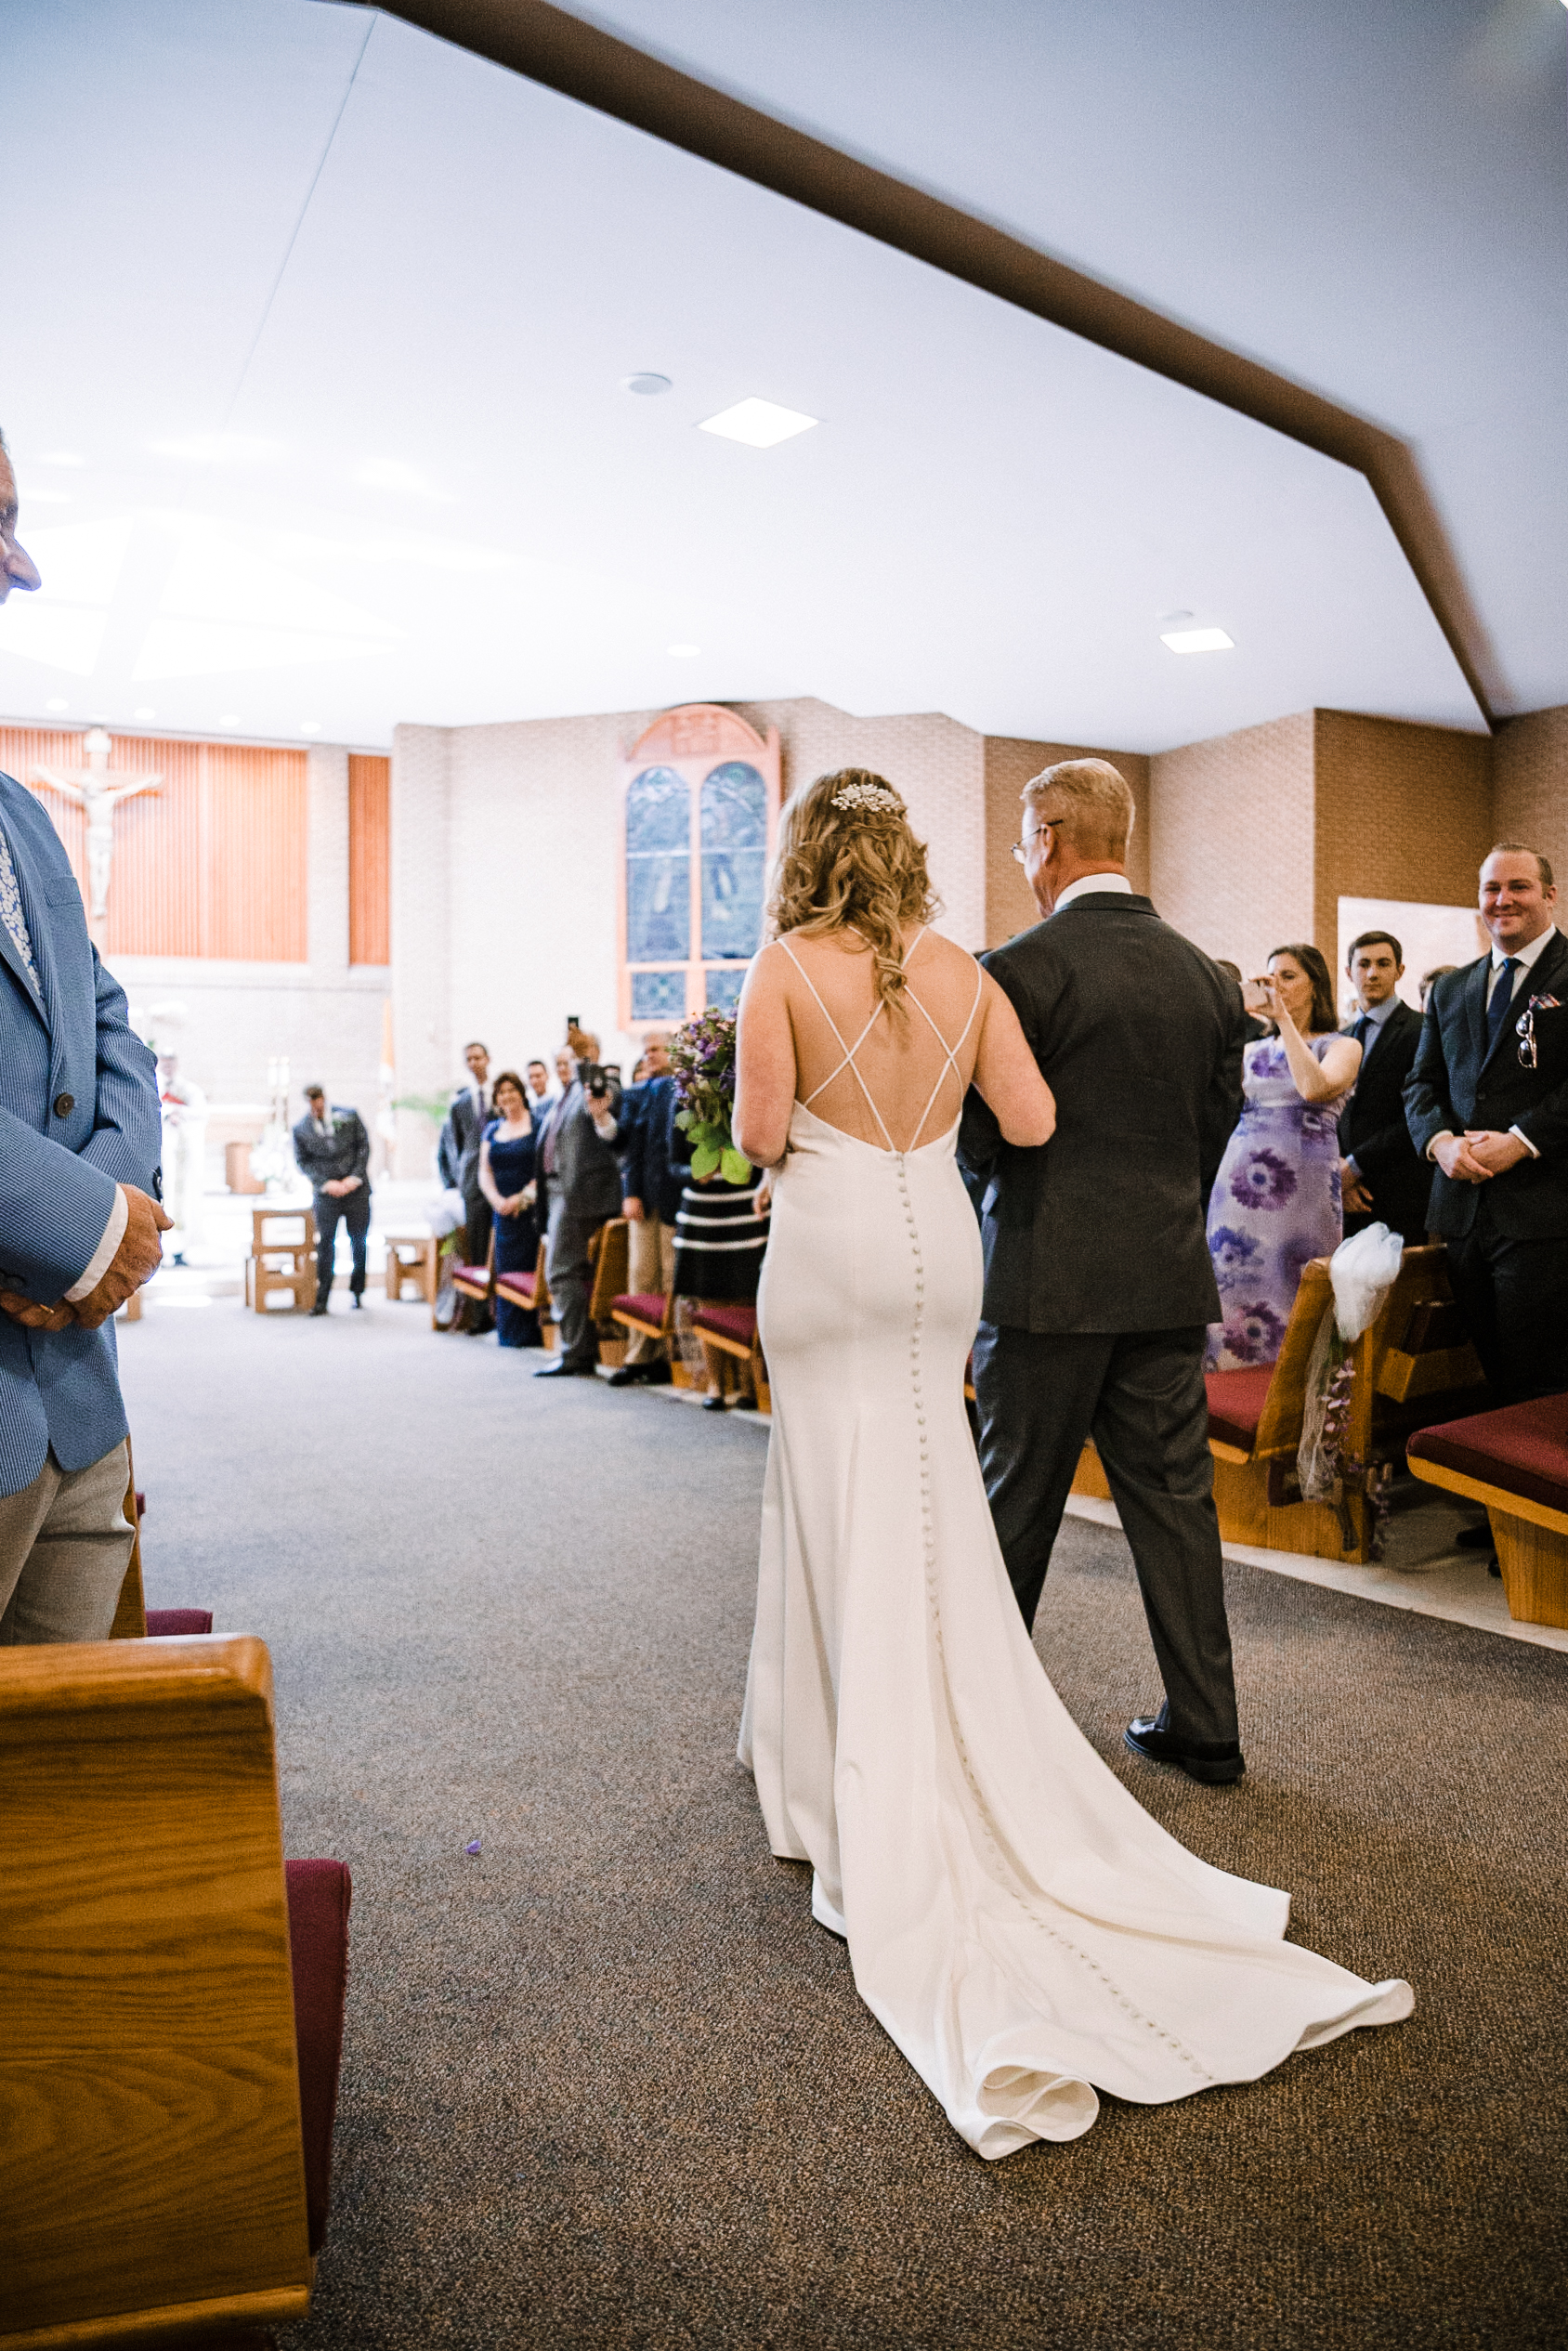 Bride walking down the aisle at St. Bernadette Catholic Church